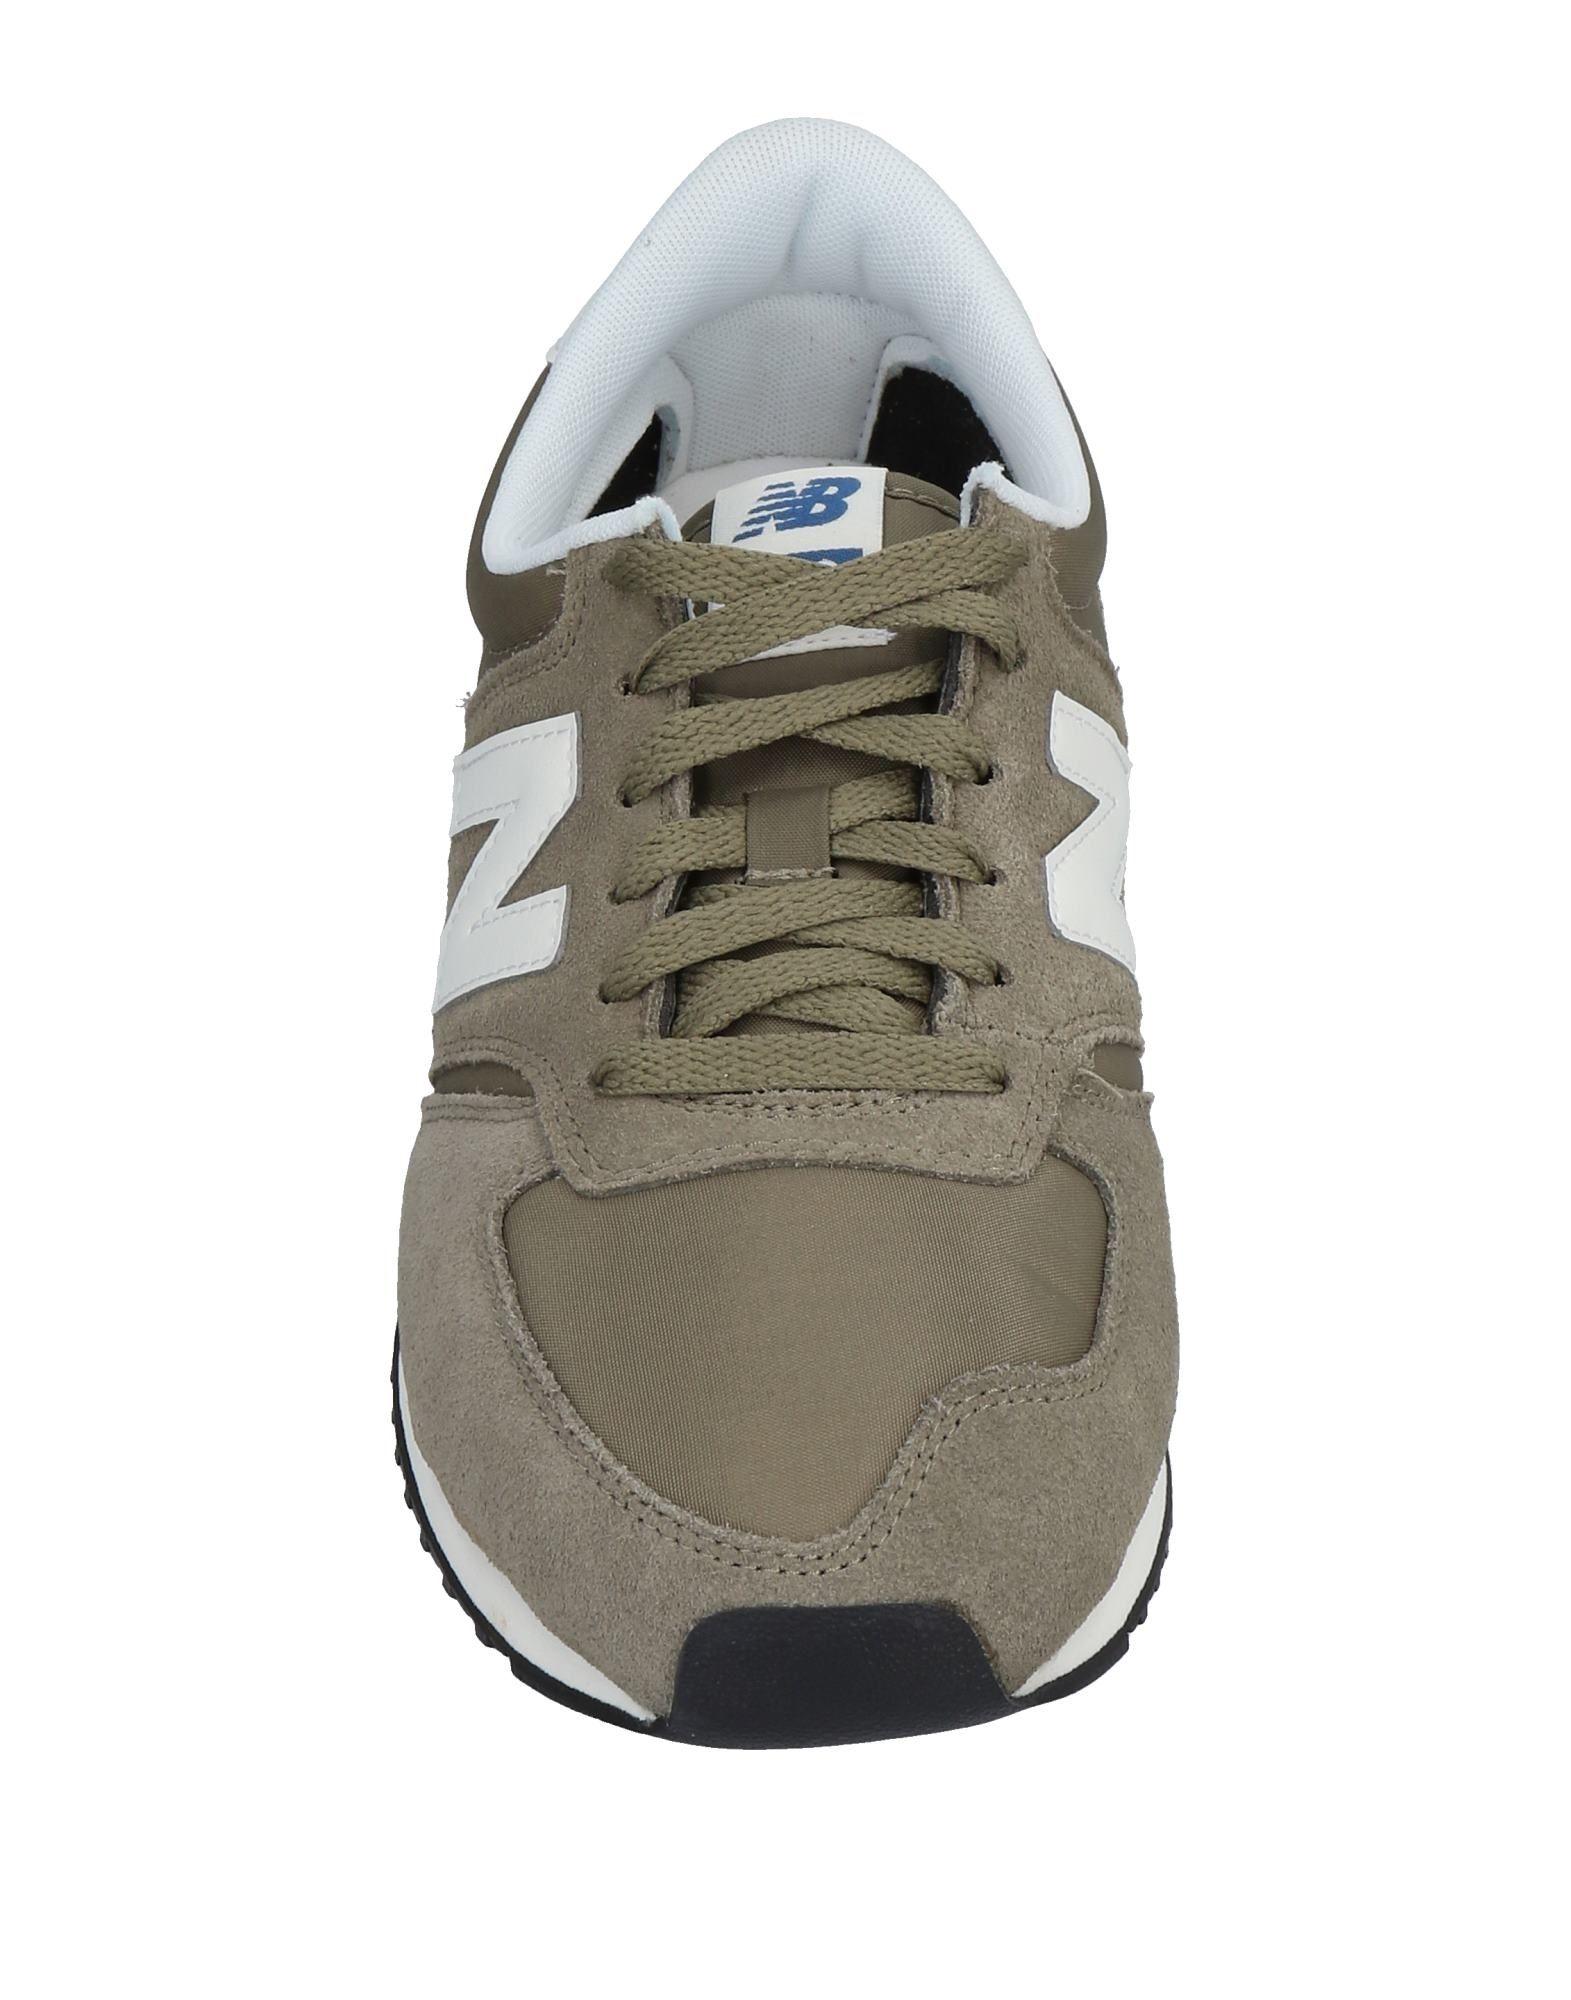 New Balance Herren Sneakers Herren Balance  11476856RN Neue Schuhe c66742